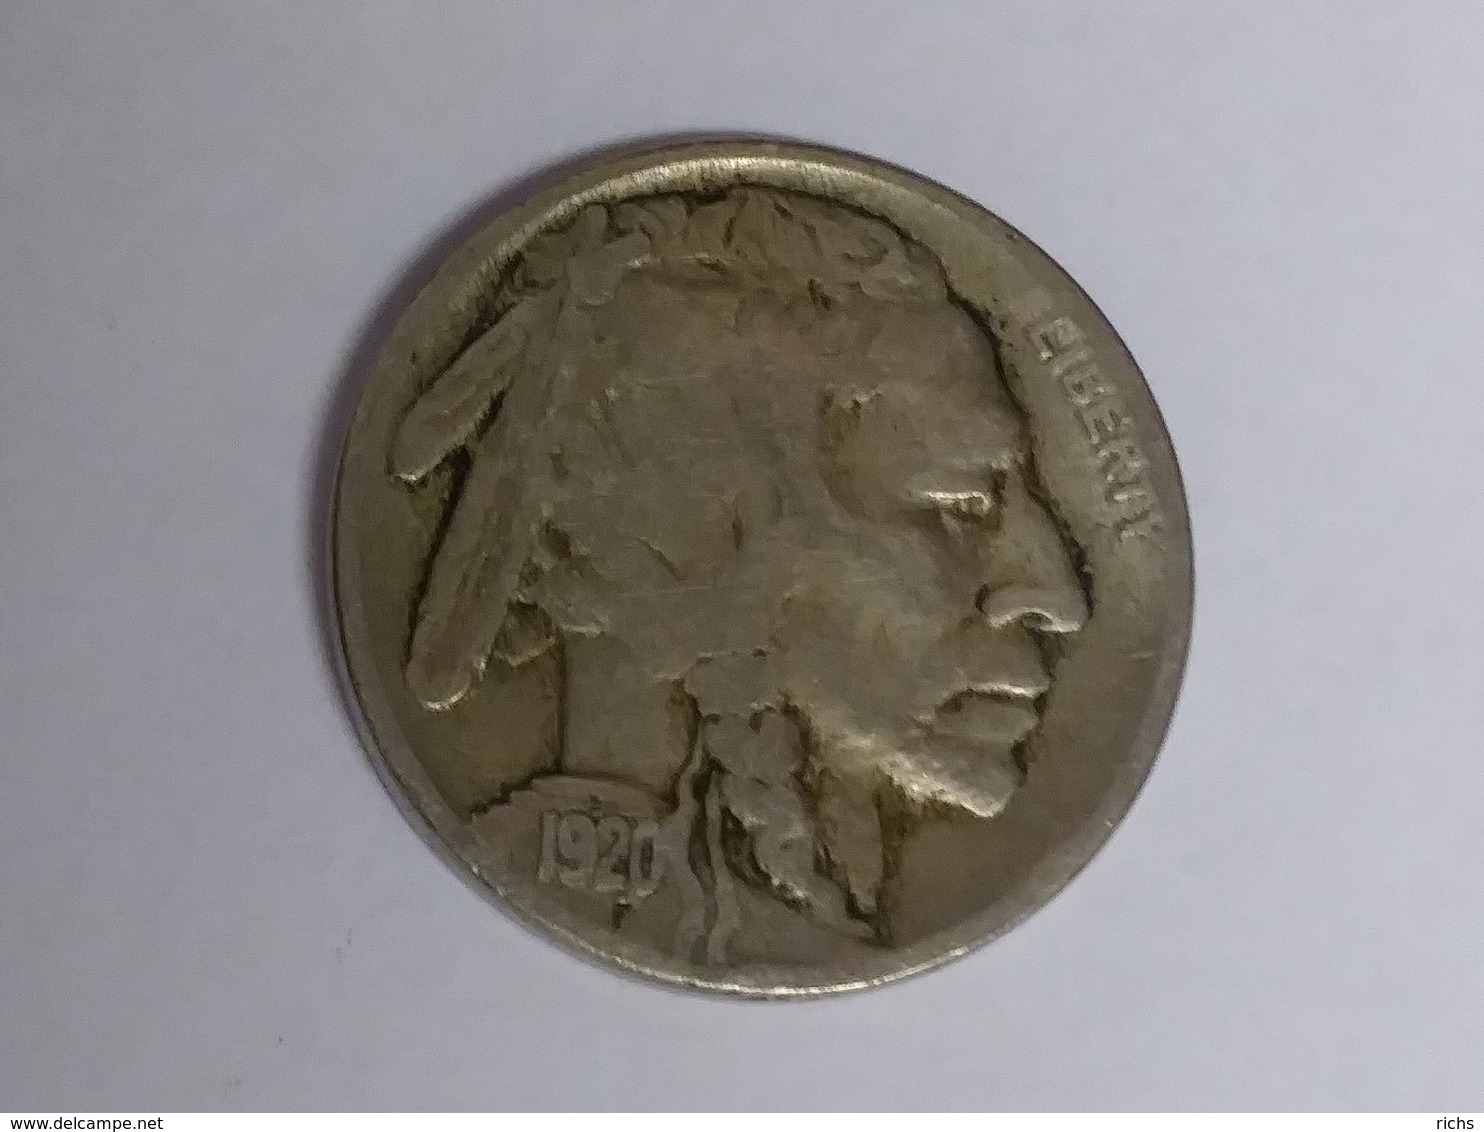 1920 Buffalo Nickel - Federal Issues